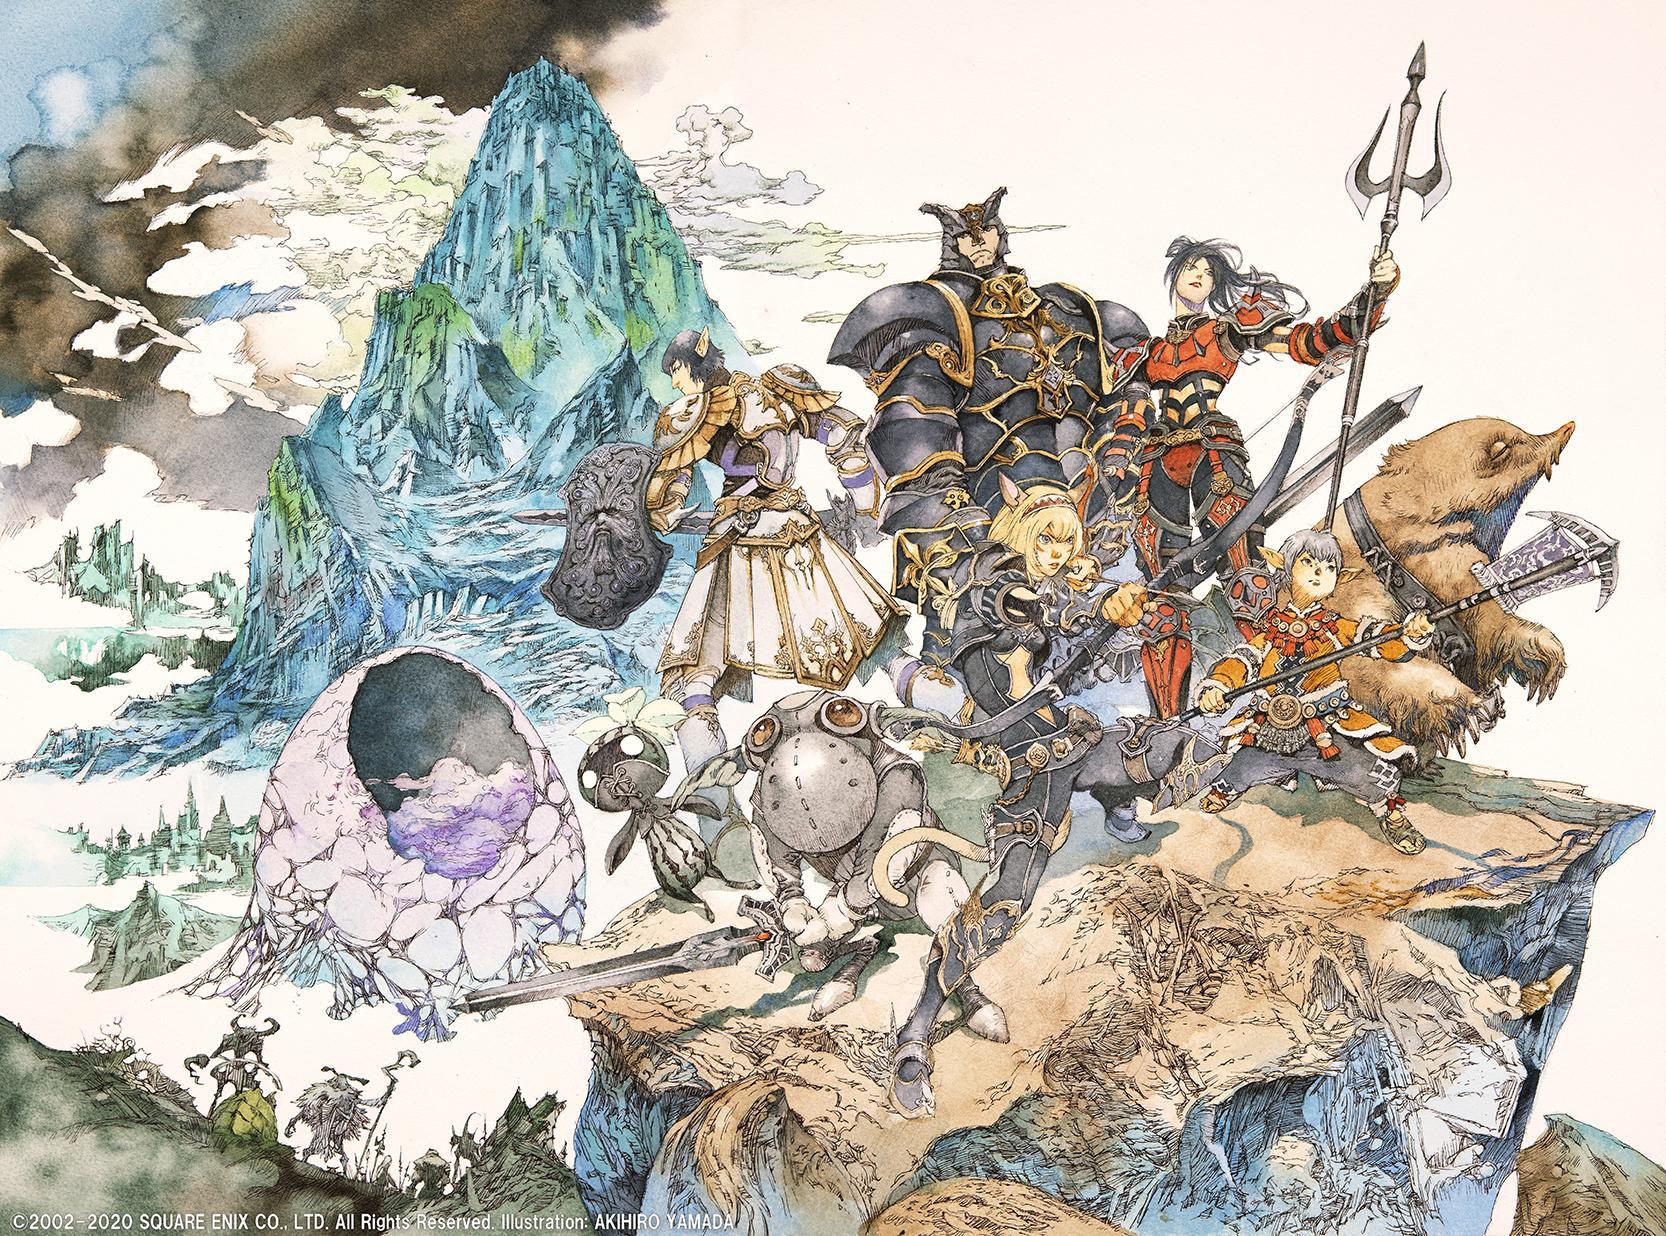 Ffxi の新ストーリー 蝕世のエンブリオ が8月6日に始動 山田章博氏のイメージイラストと特設サイトが本日公開